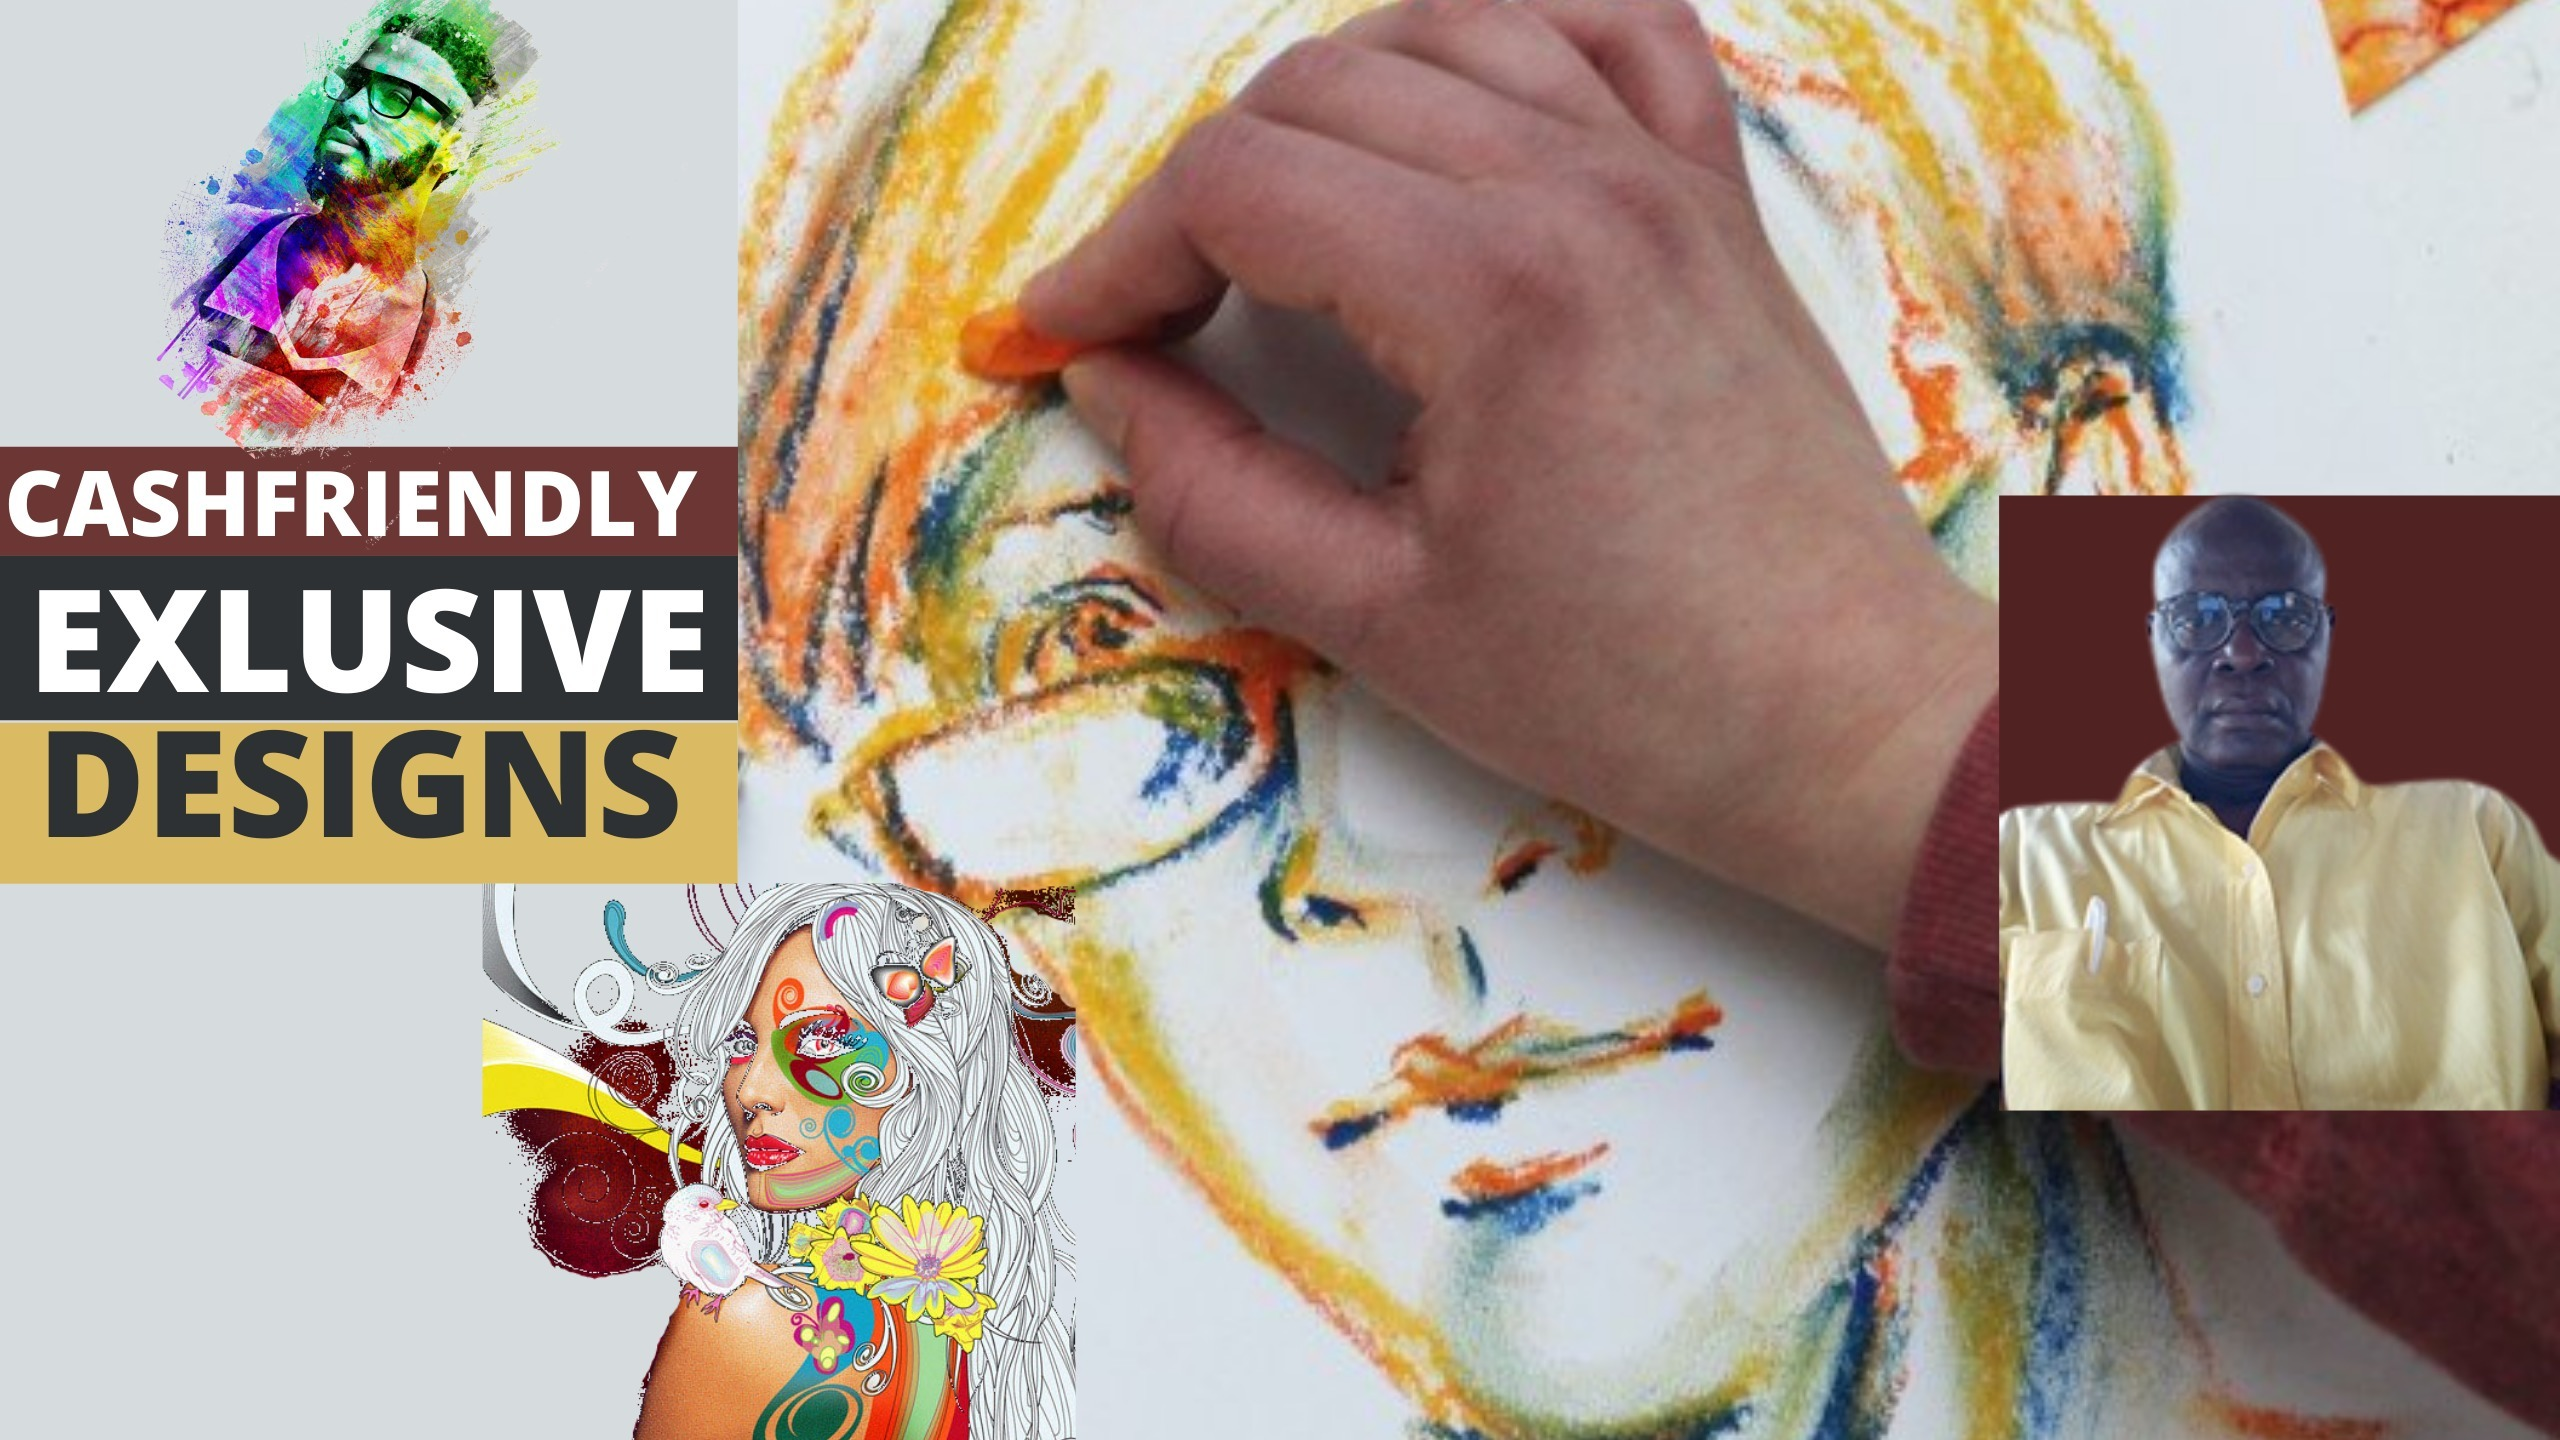 CashFriendly Exlusive Design (@cashfriendly) Cover Image